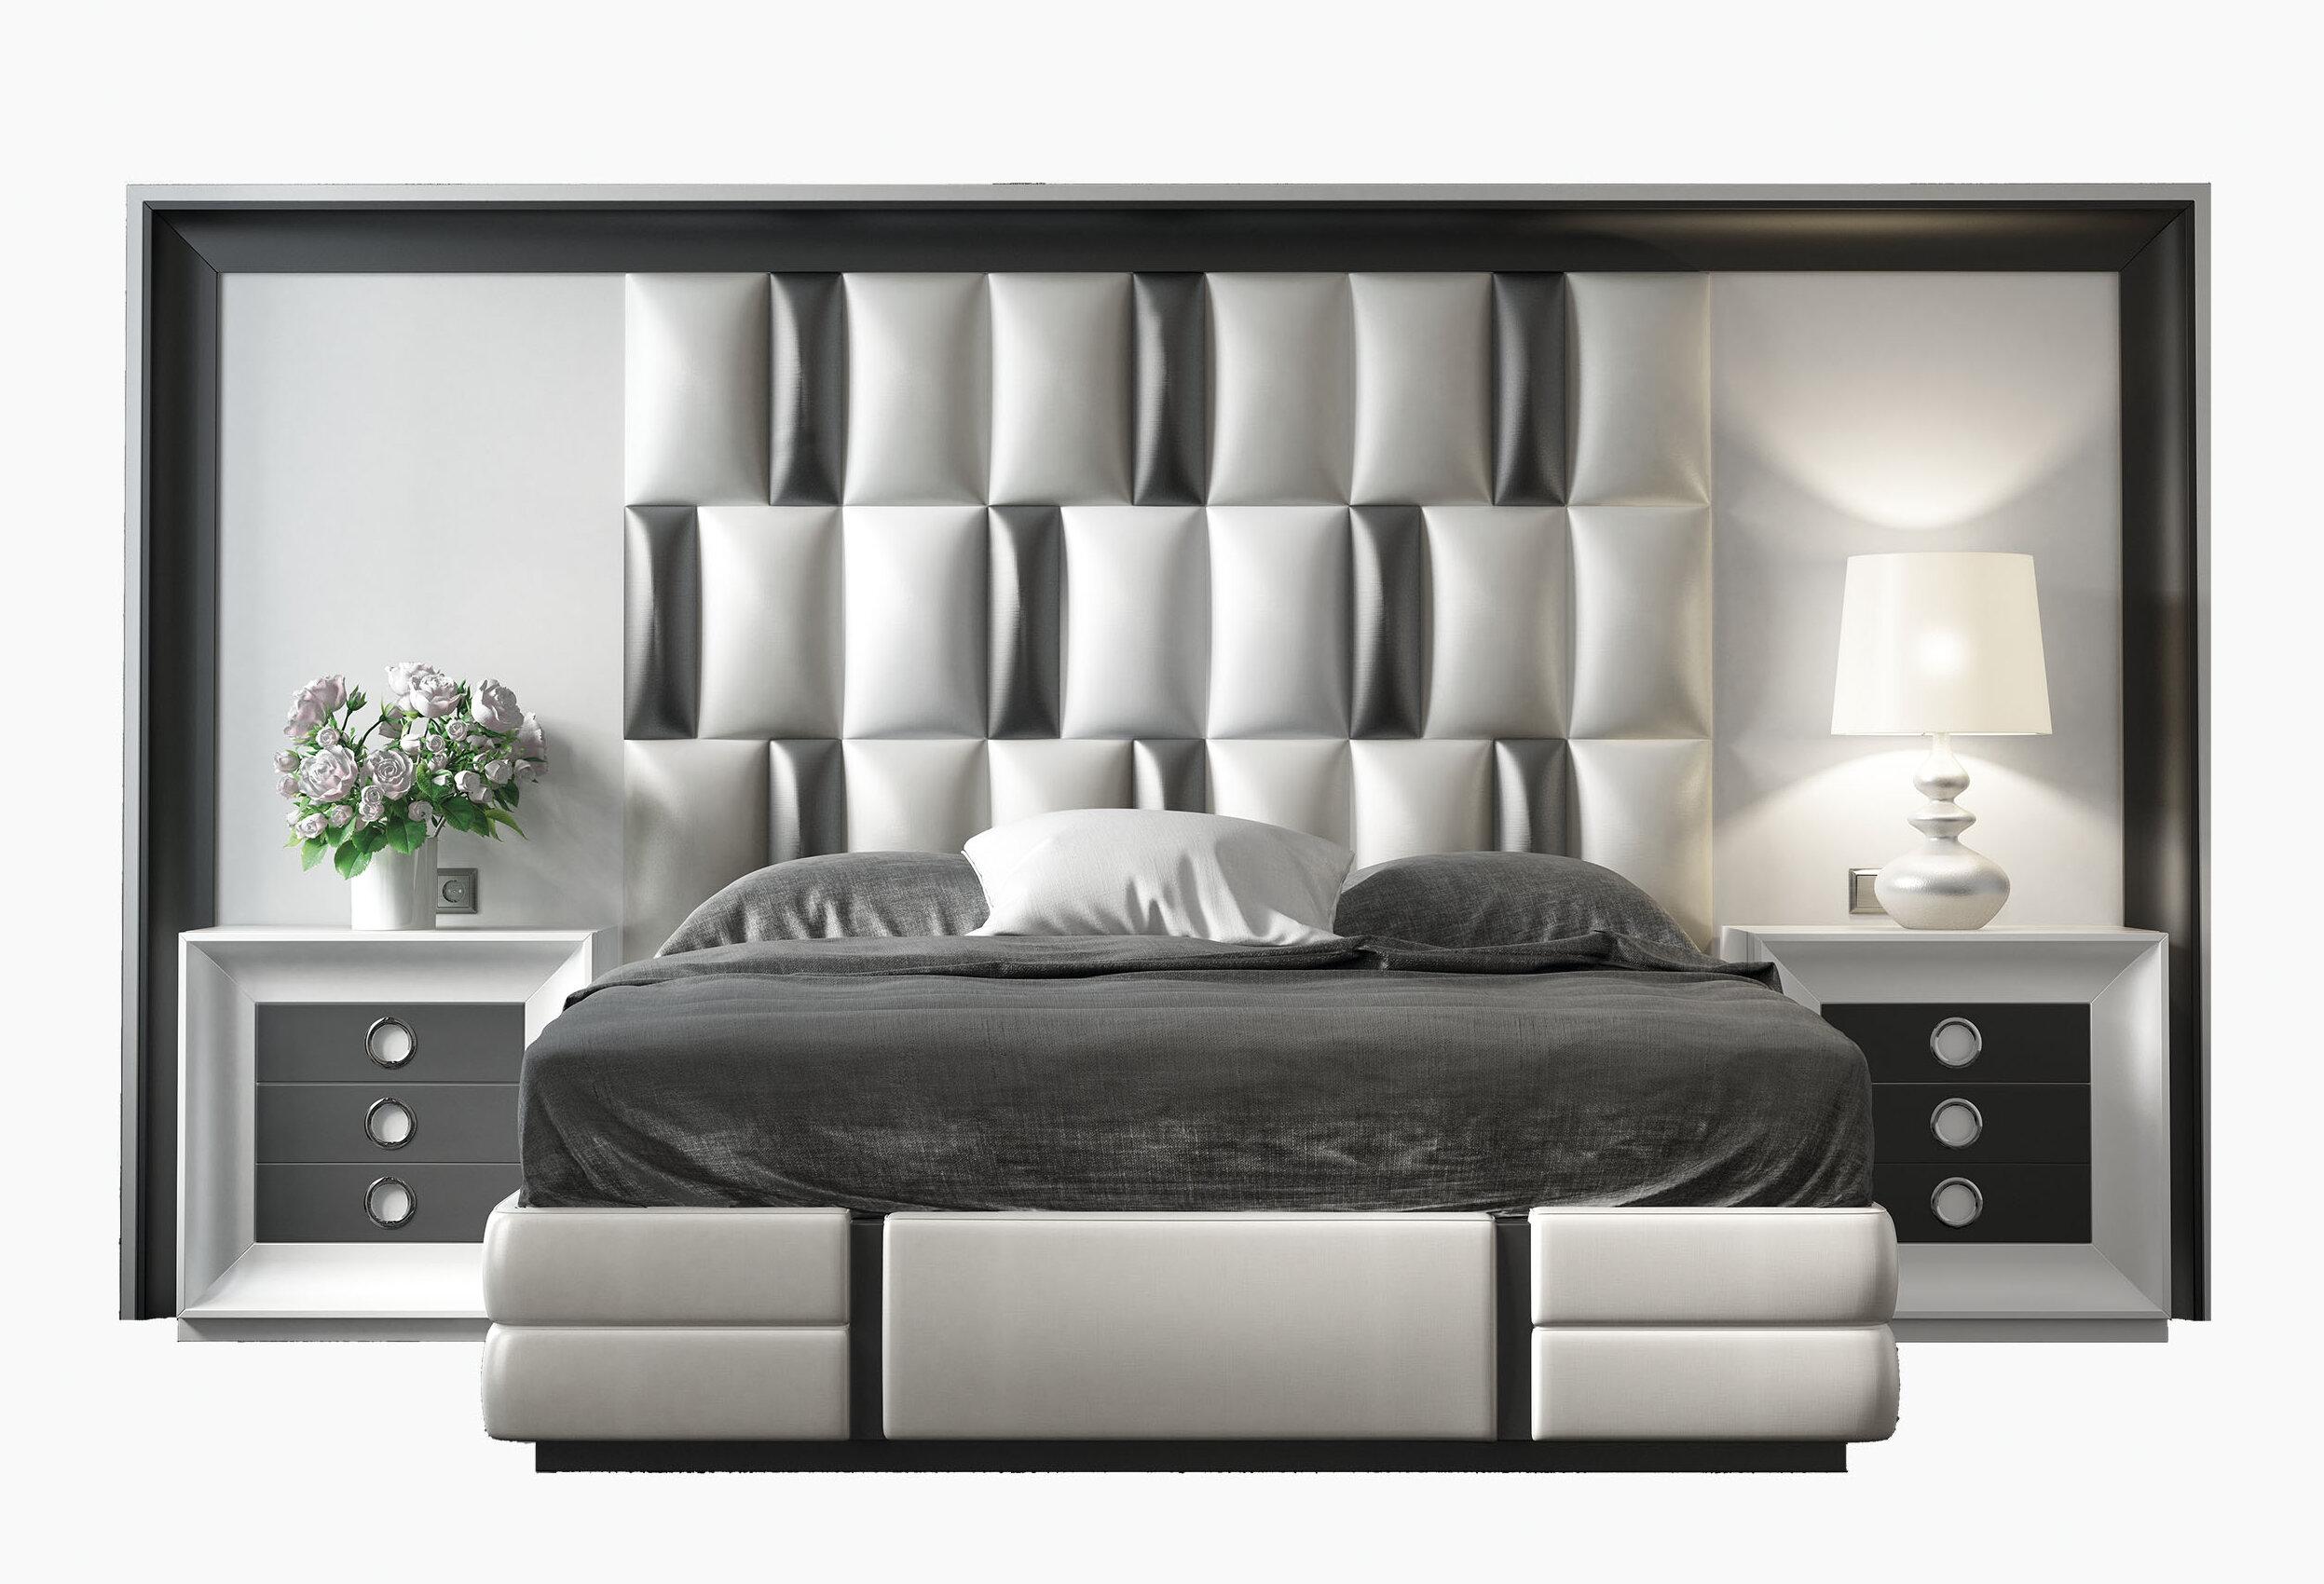 Hispania Home London Bedor101 Bedroom Wayfair